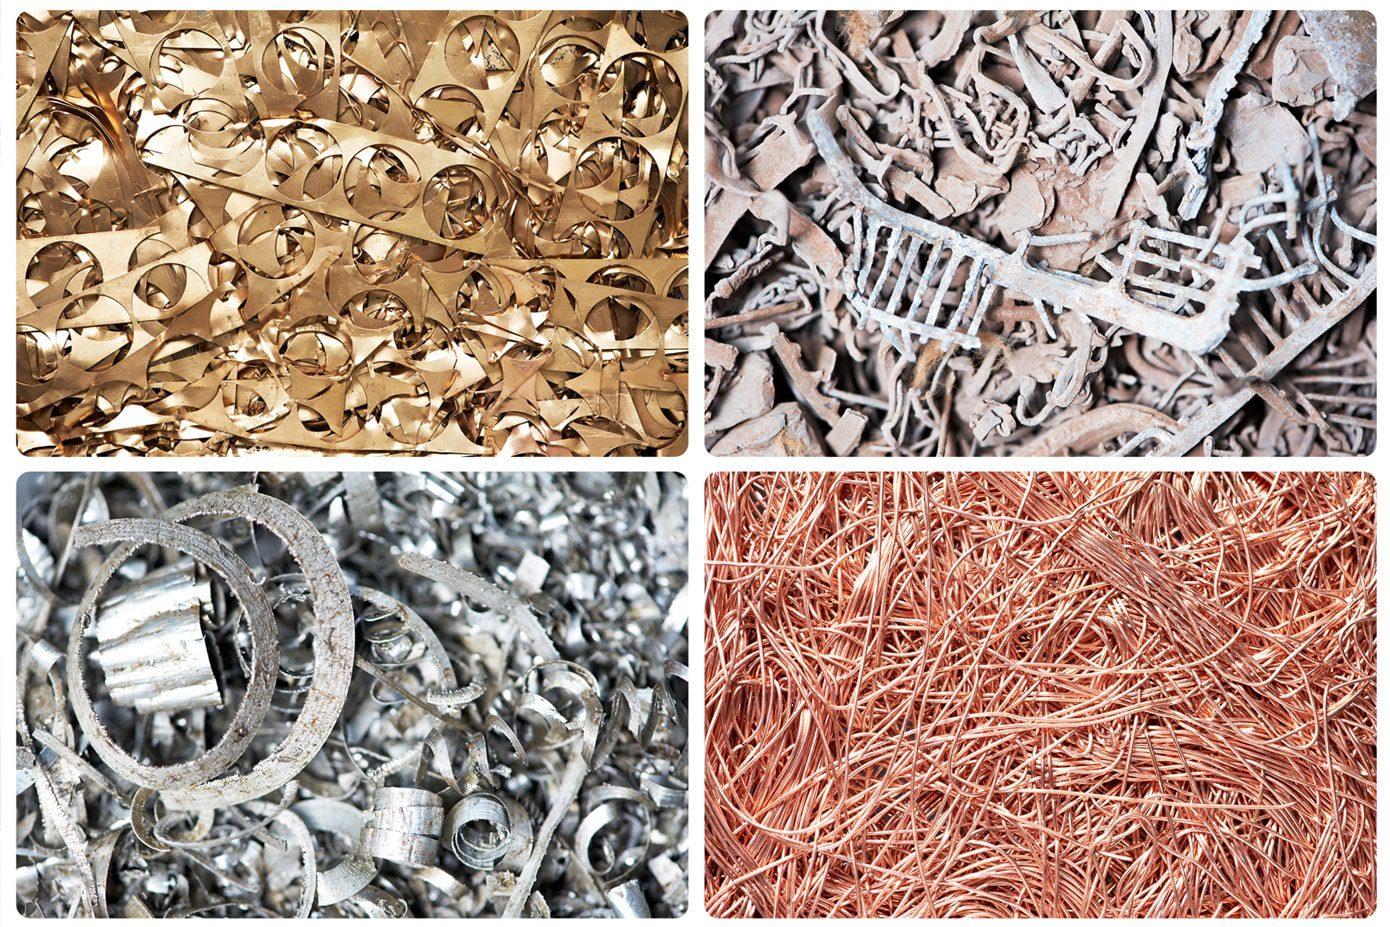 2018 forecast for chin non ferrous metal •mr zhang zhengji, chairman of chalco shandong co, ltd •mr li zhicong, vice president of china minmetals nonferrous metals co, ltd •mr dong changqing, member of the board of china nonferrous metal mining (group) co, ltd.